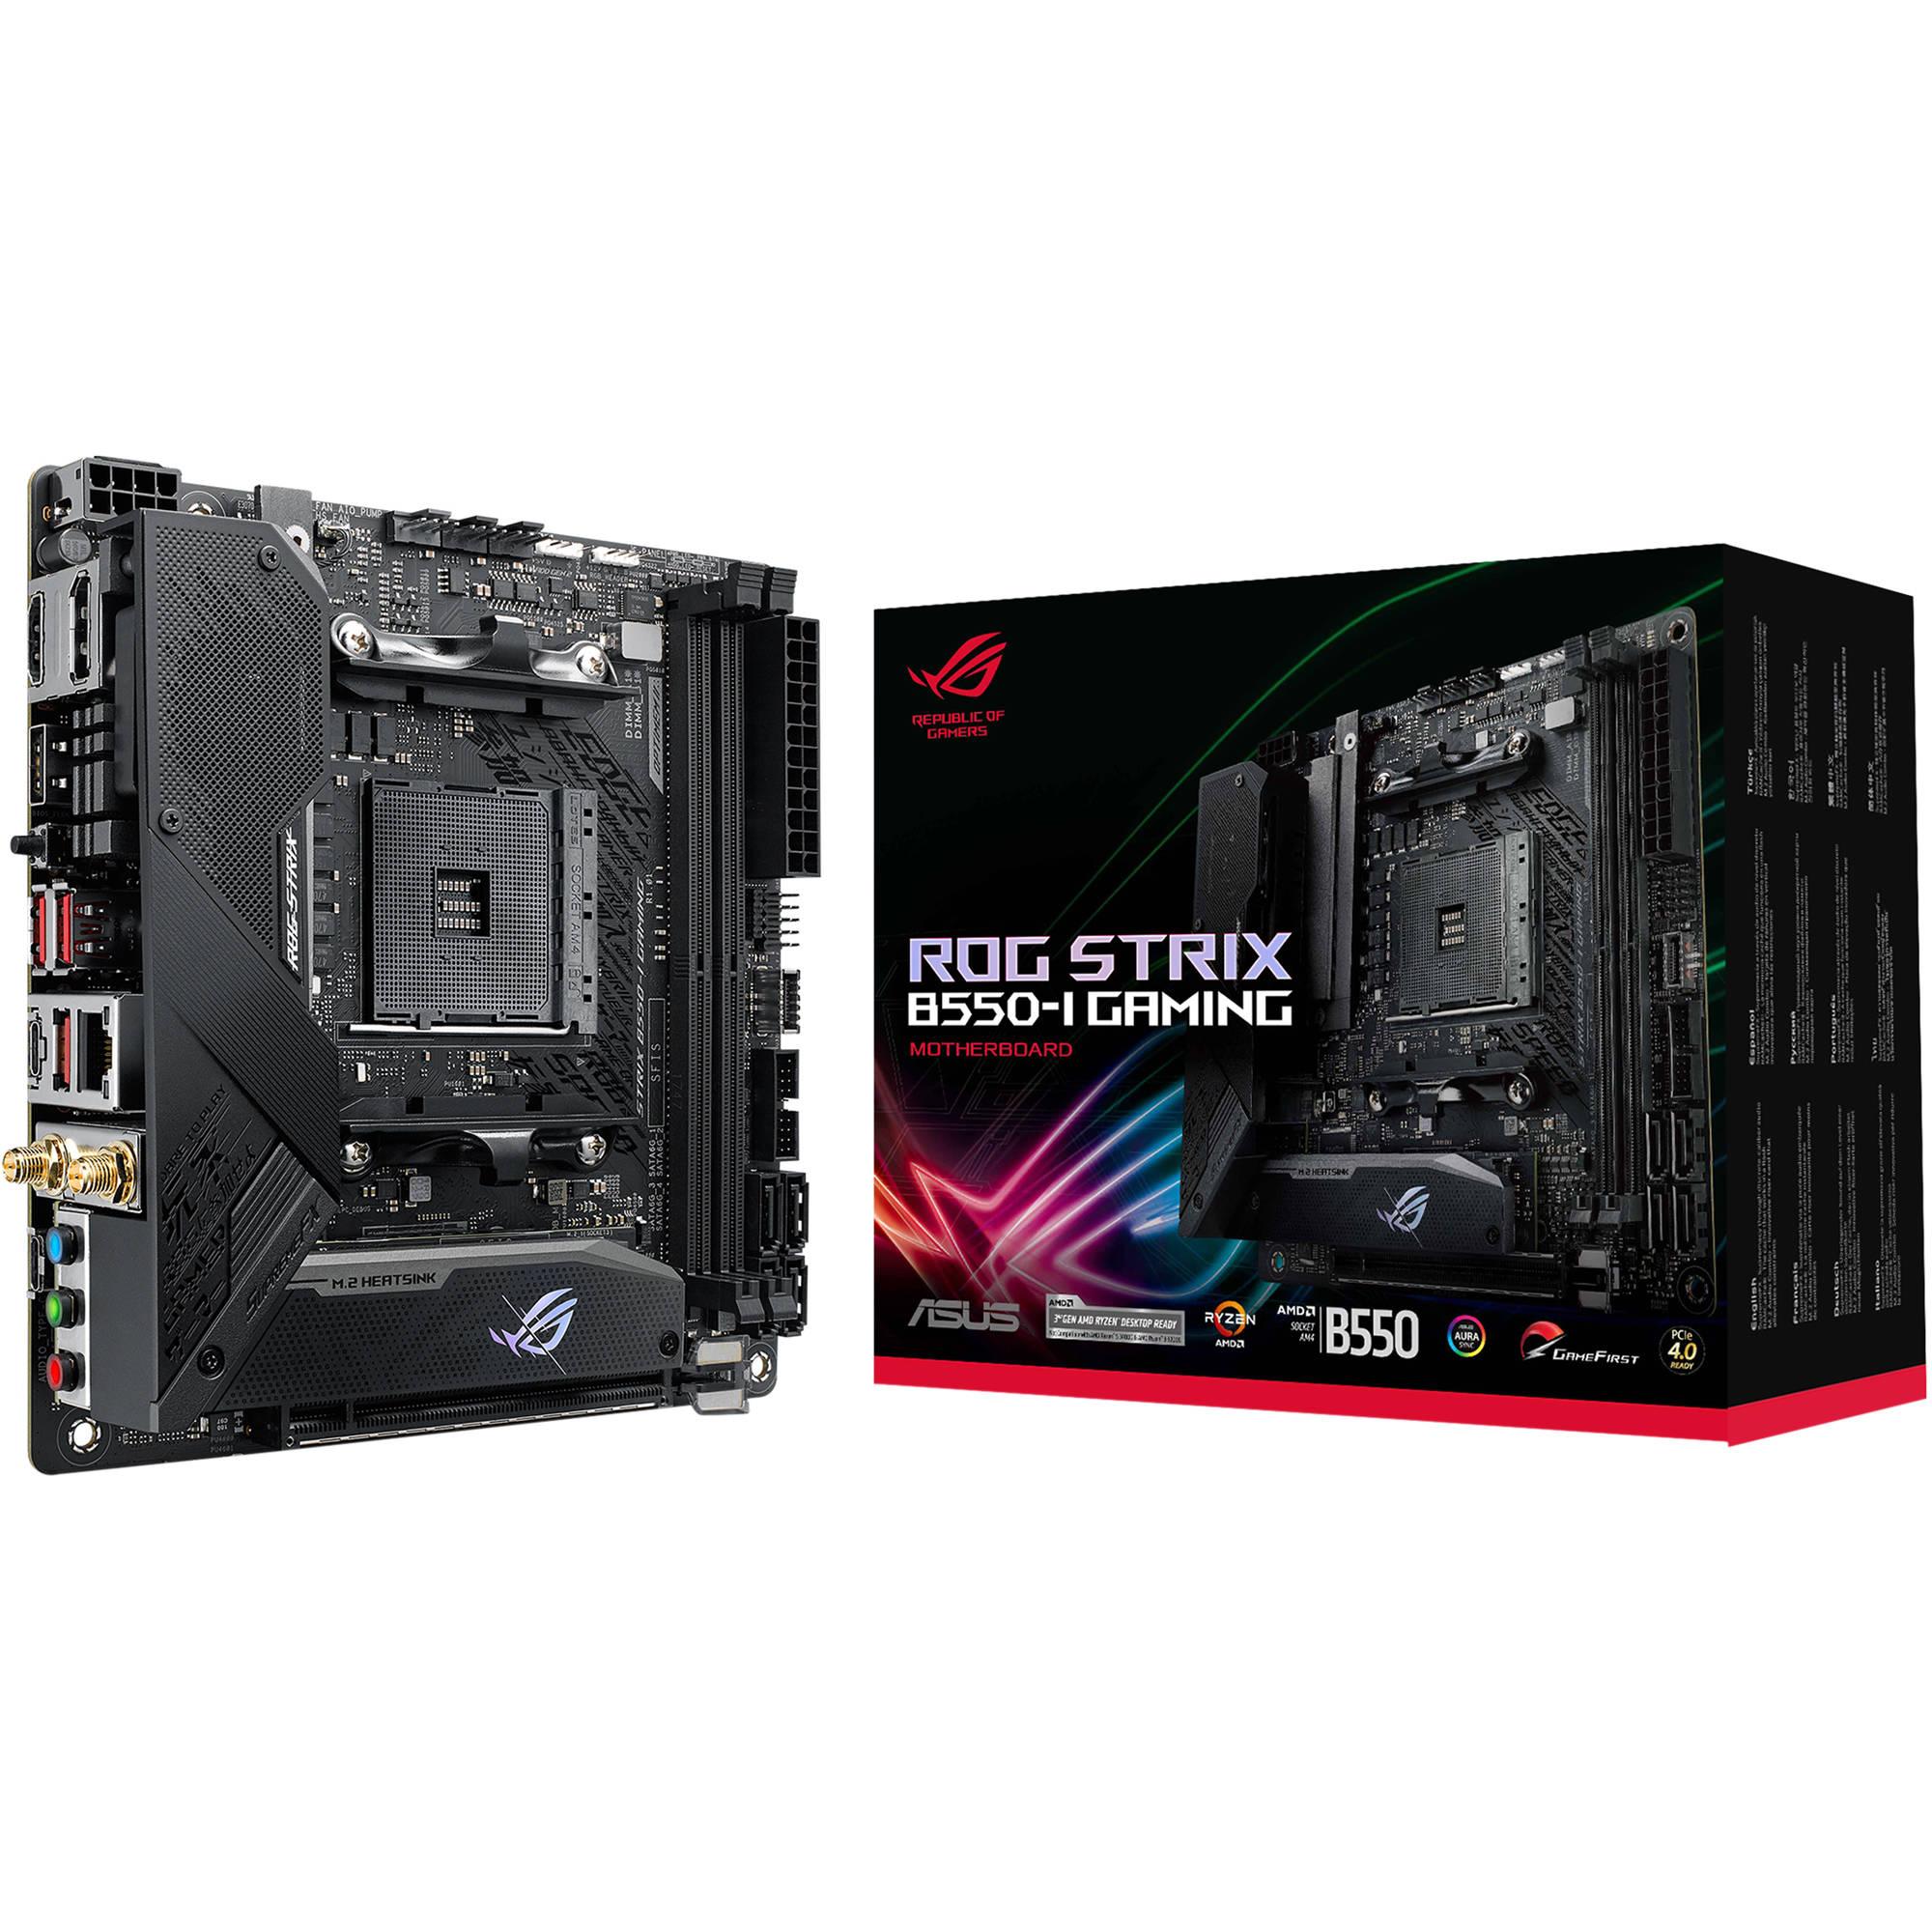 ASUS Republic of Gamers Strix B550-I AM4 ROG STRIX B550-I GAMING